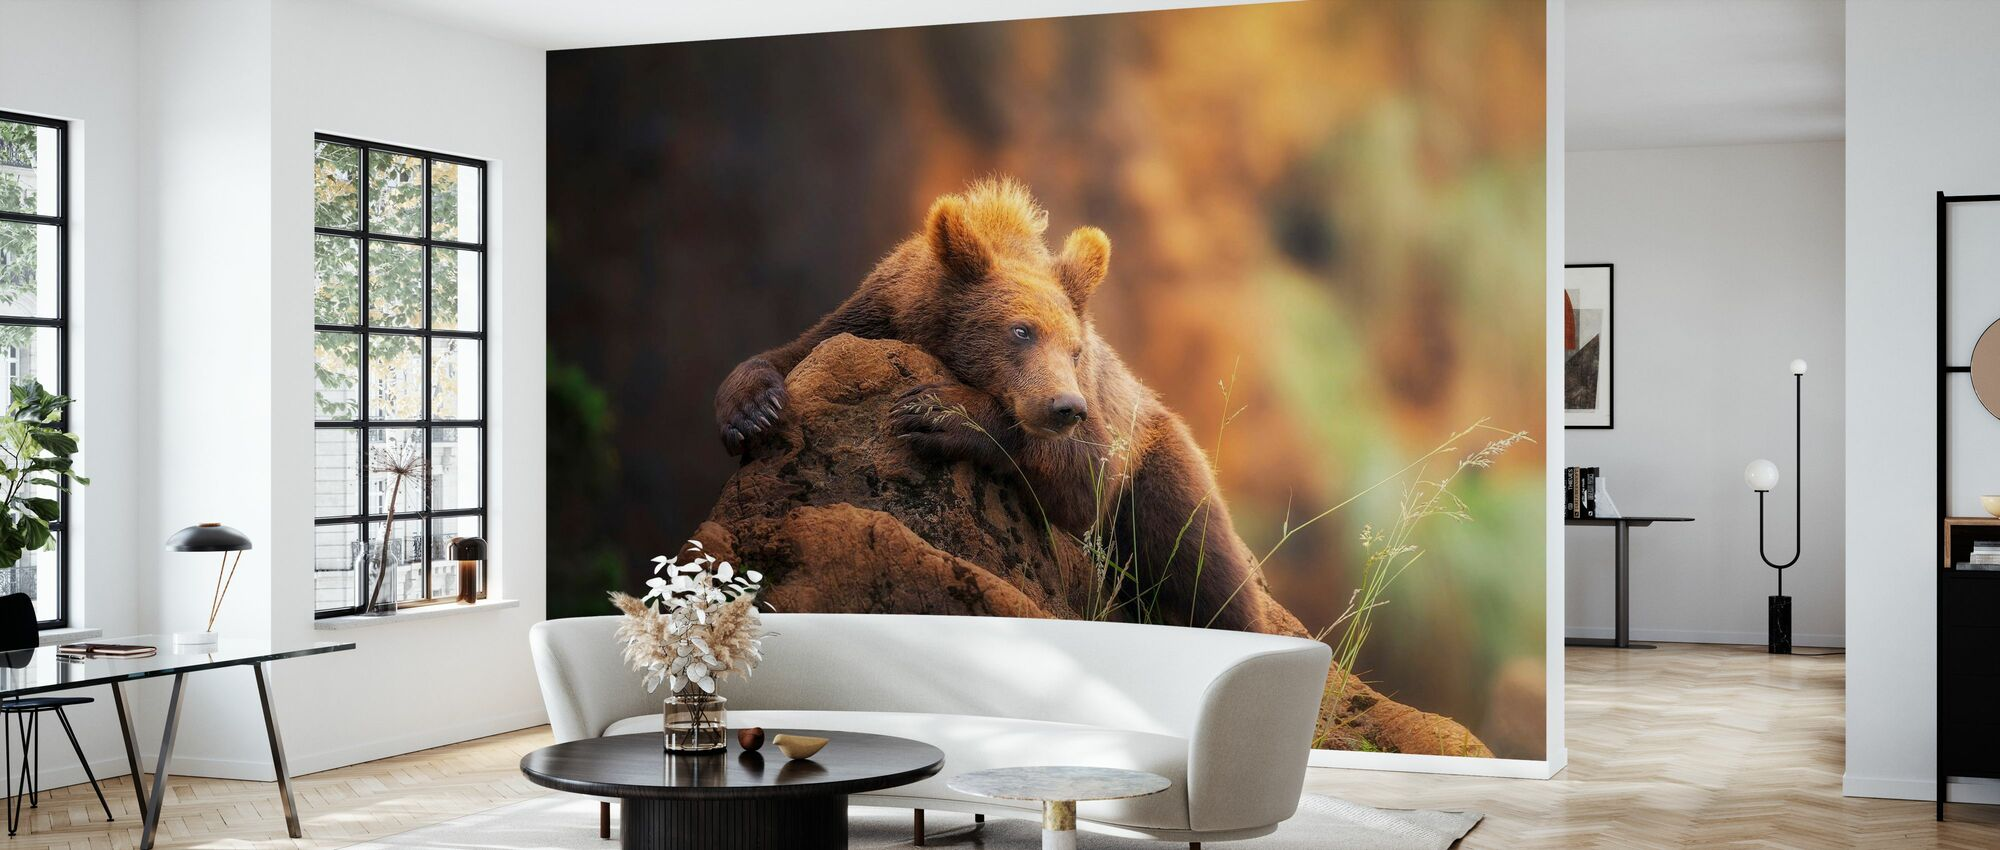 Brown Bear - Wallpaper - Living Room